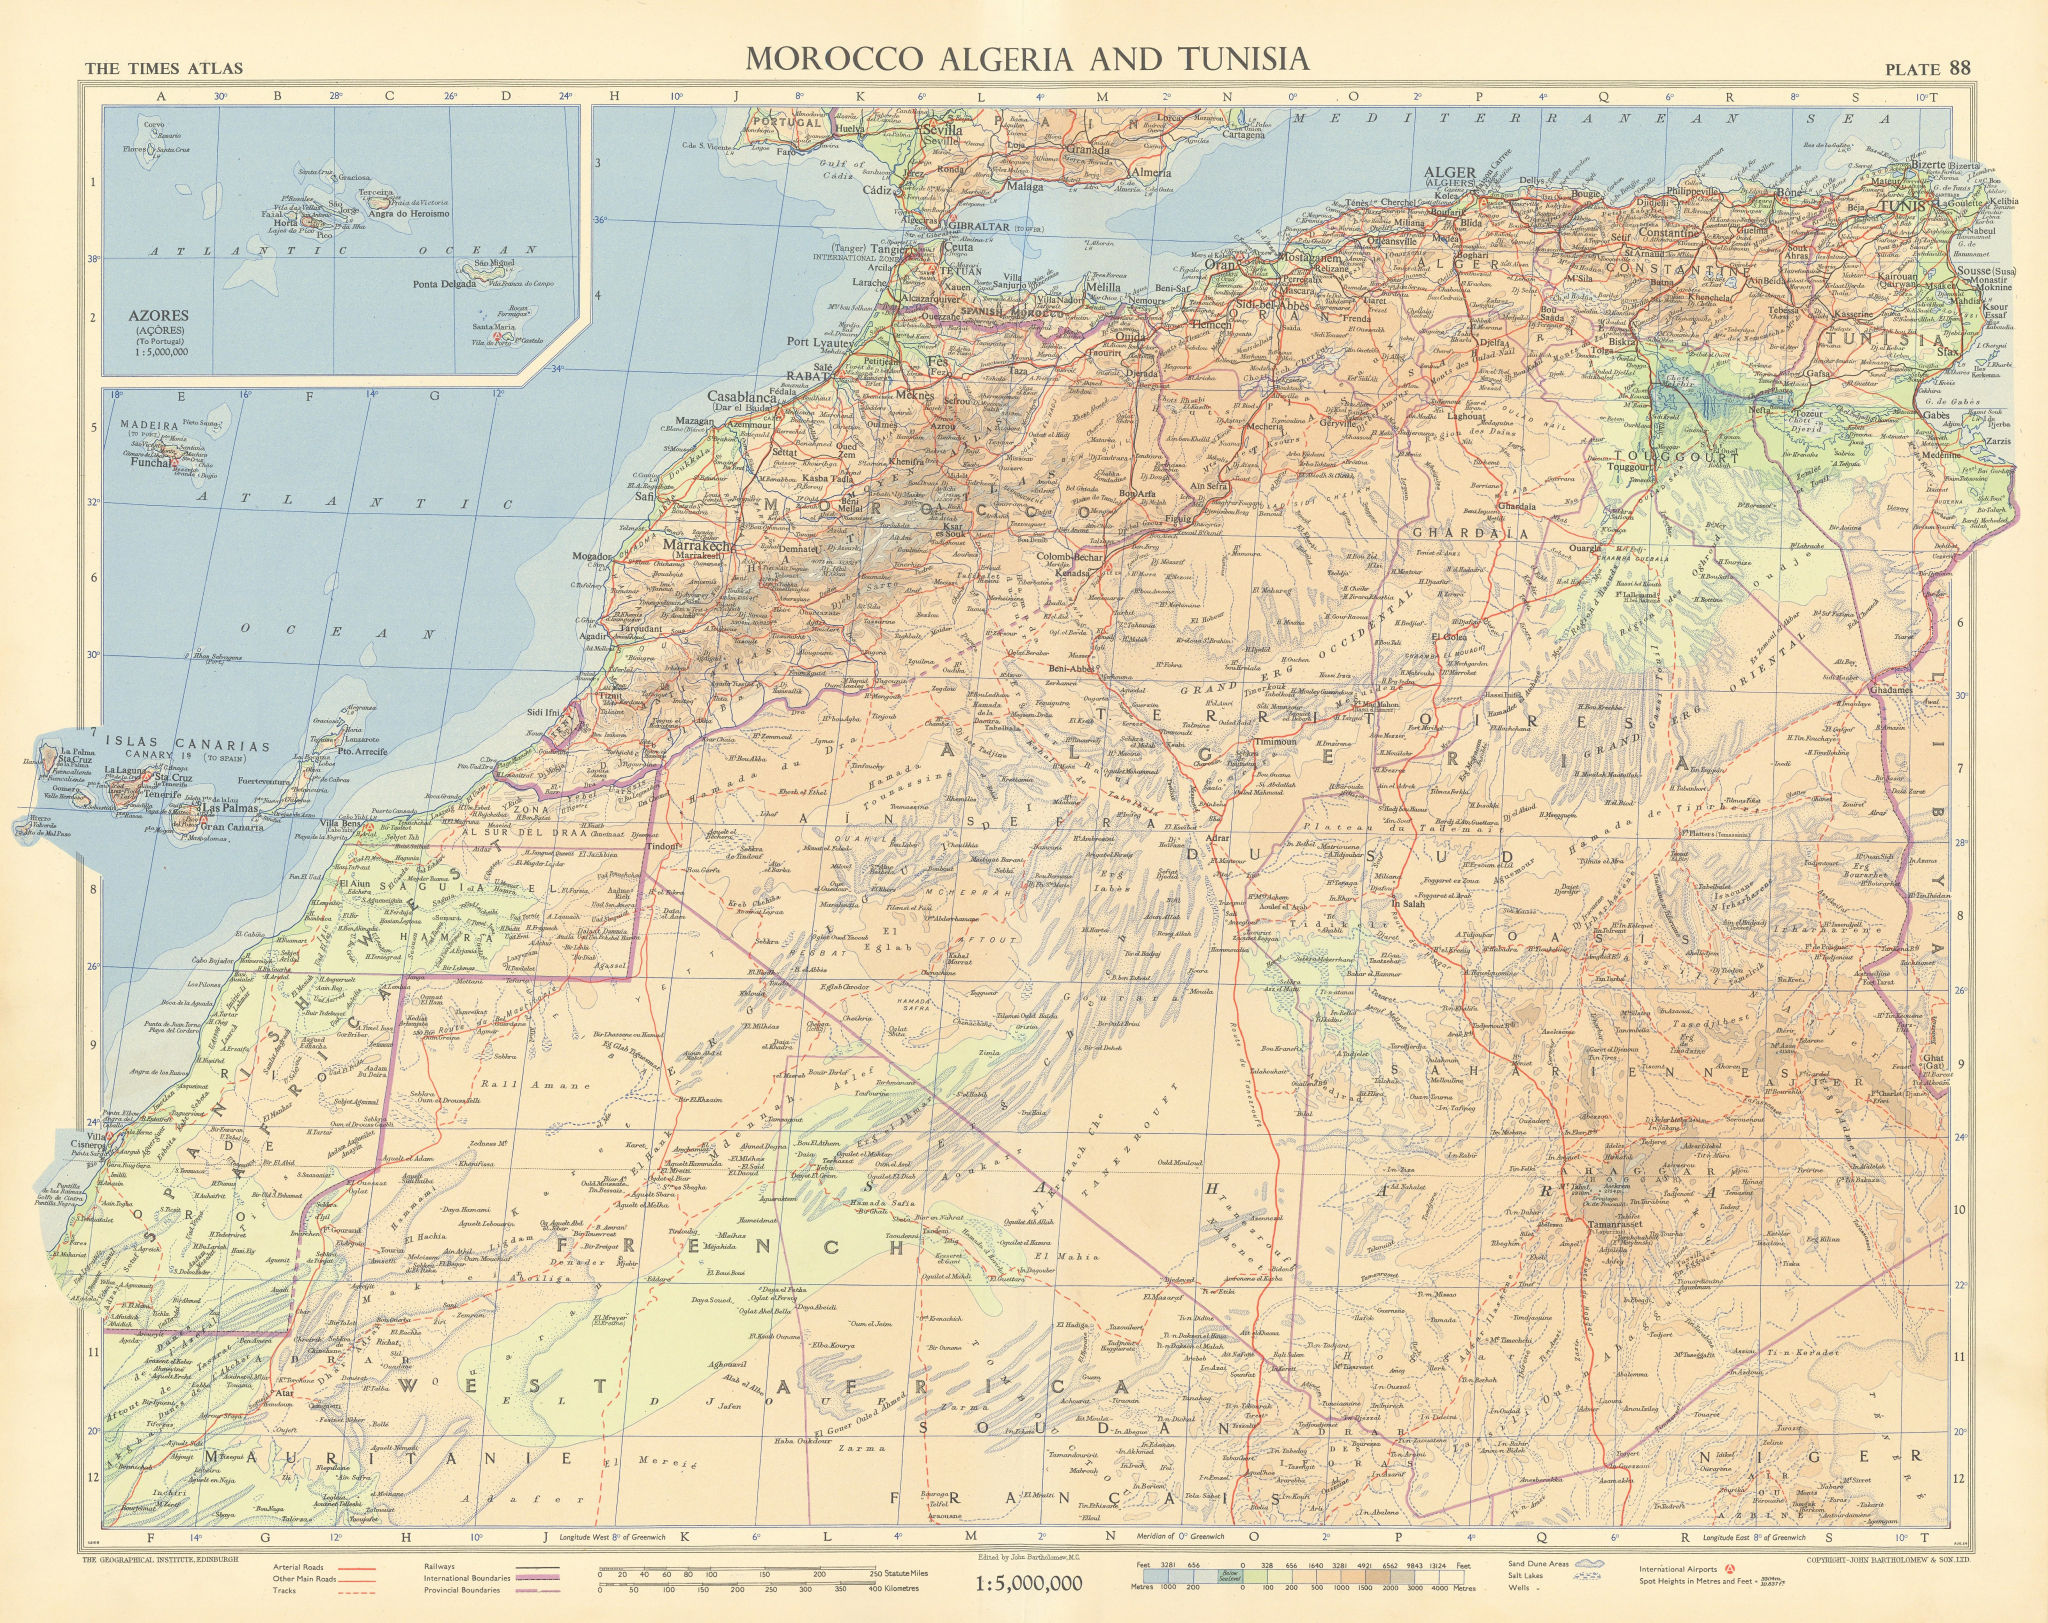 Morocco Algeria. French & Spanish West Africa. Sahara sand dunes. TIMES 1956 map